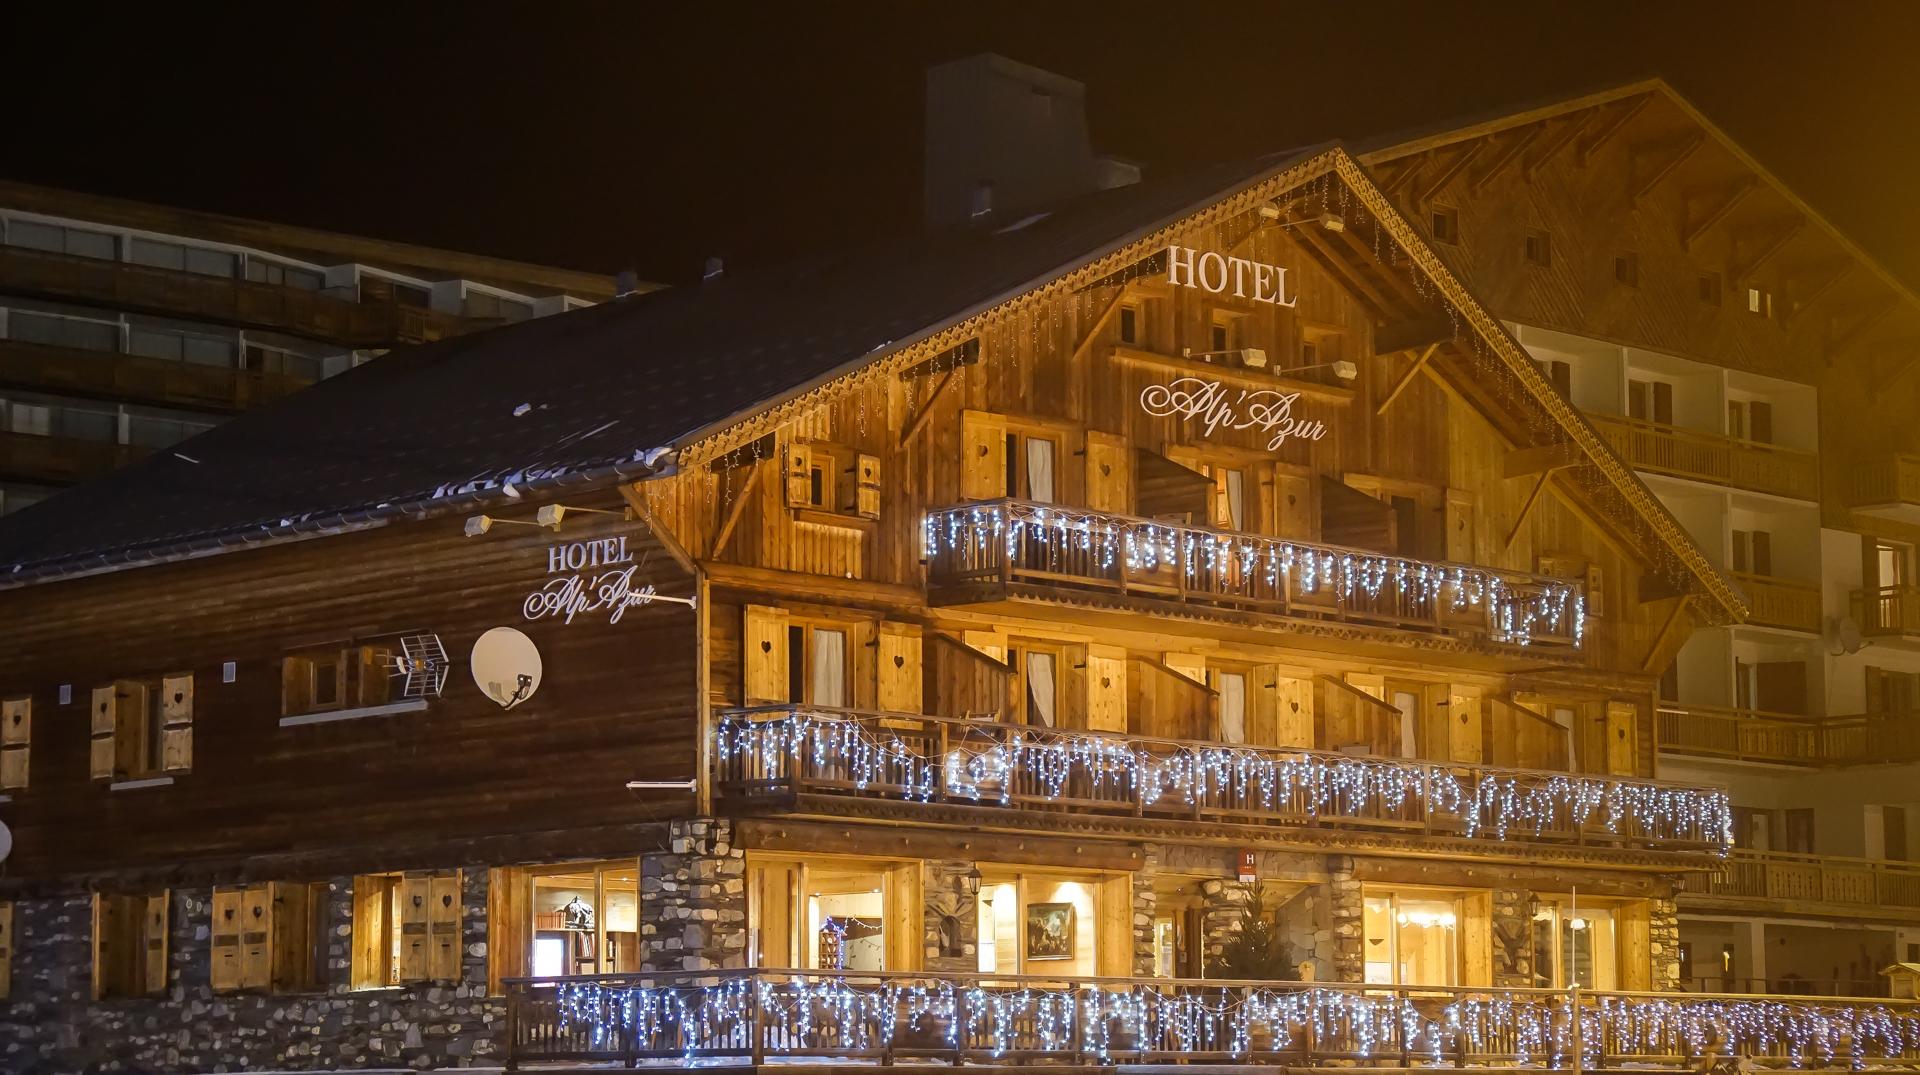 Hôtel Alp'Azur